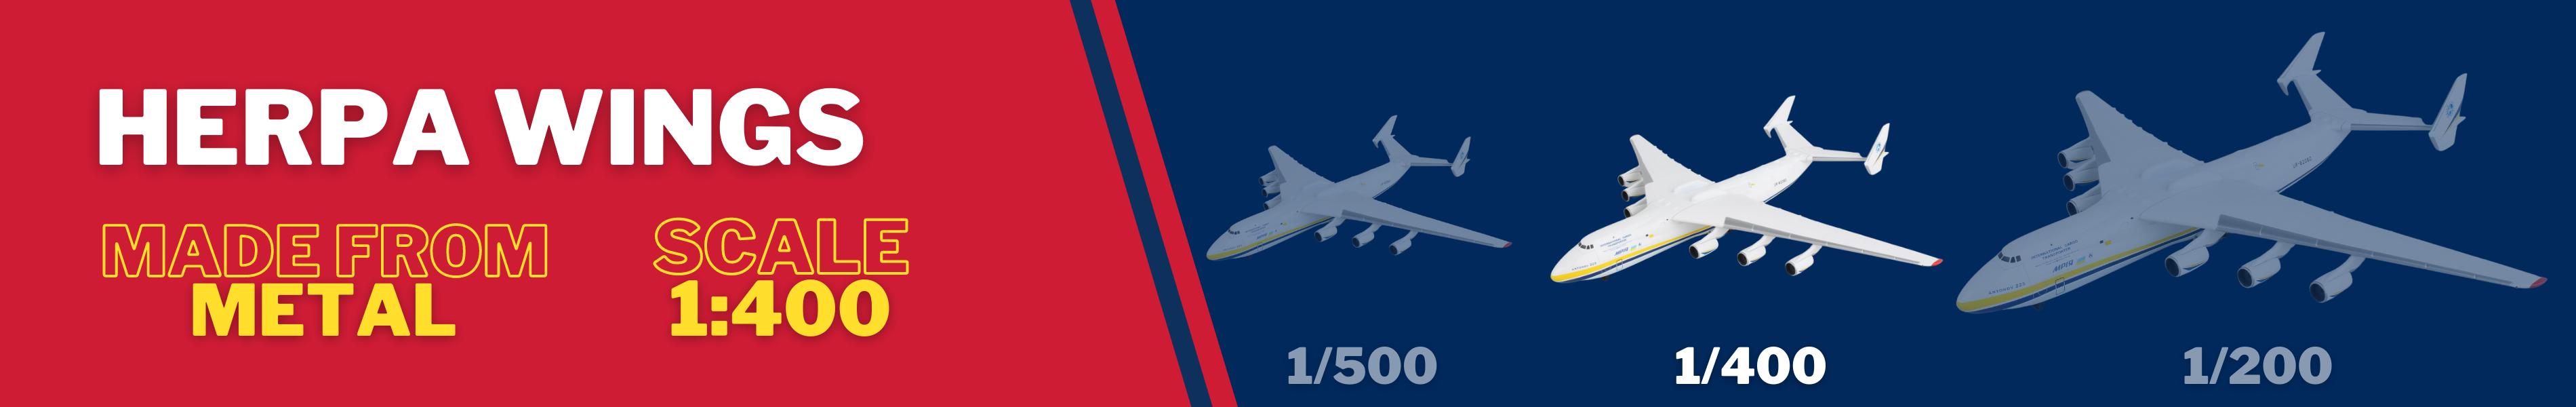 1-400-herpa.png